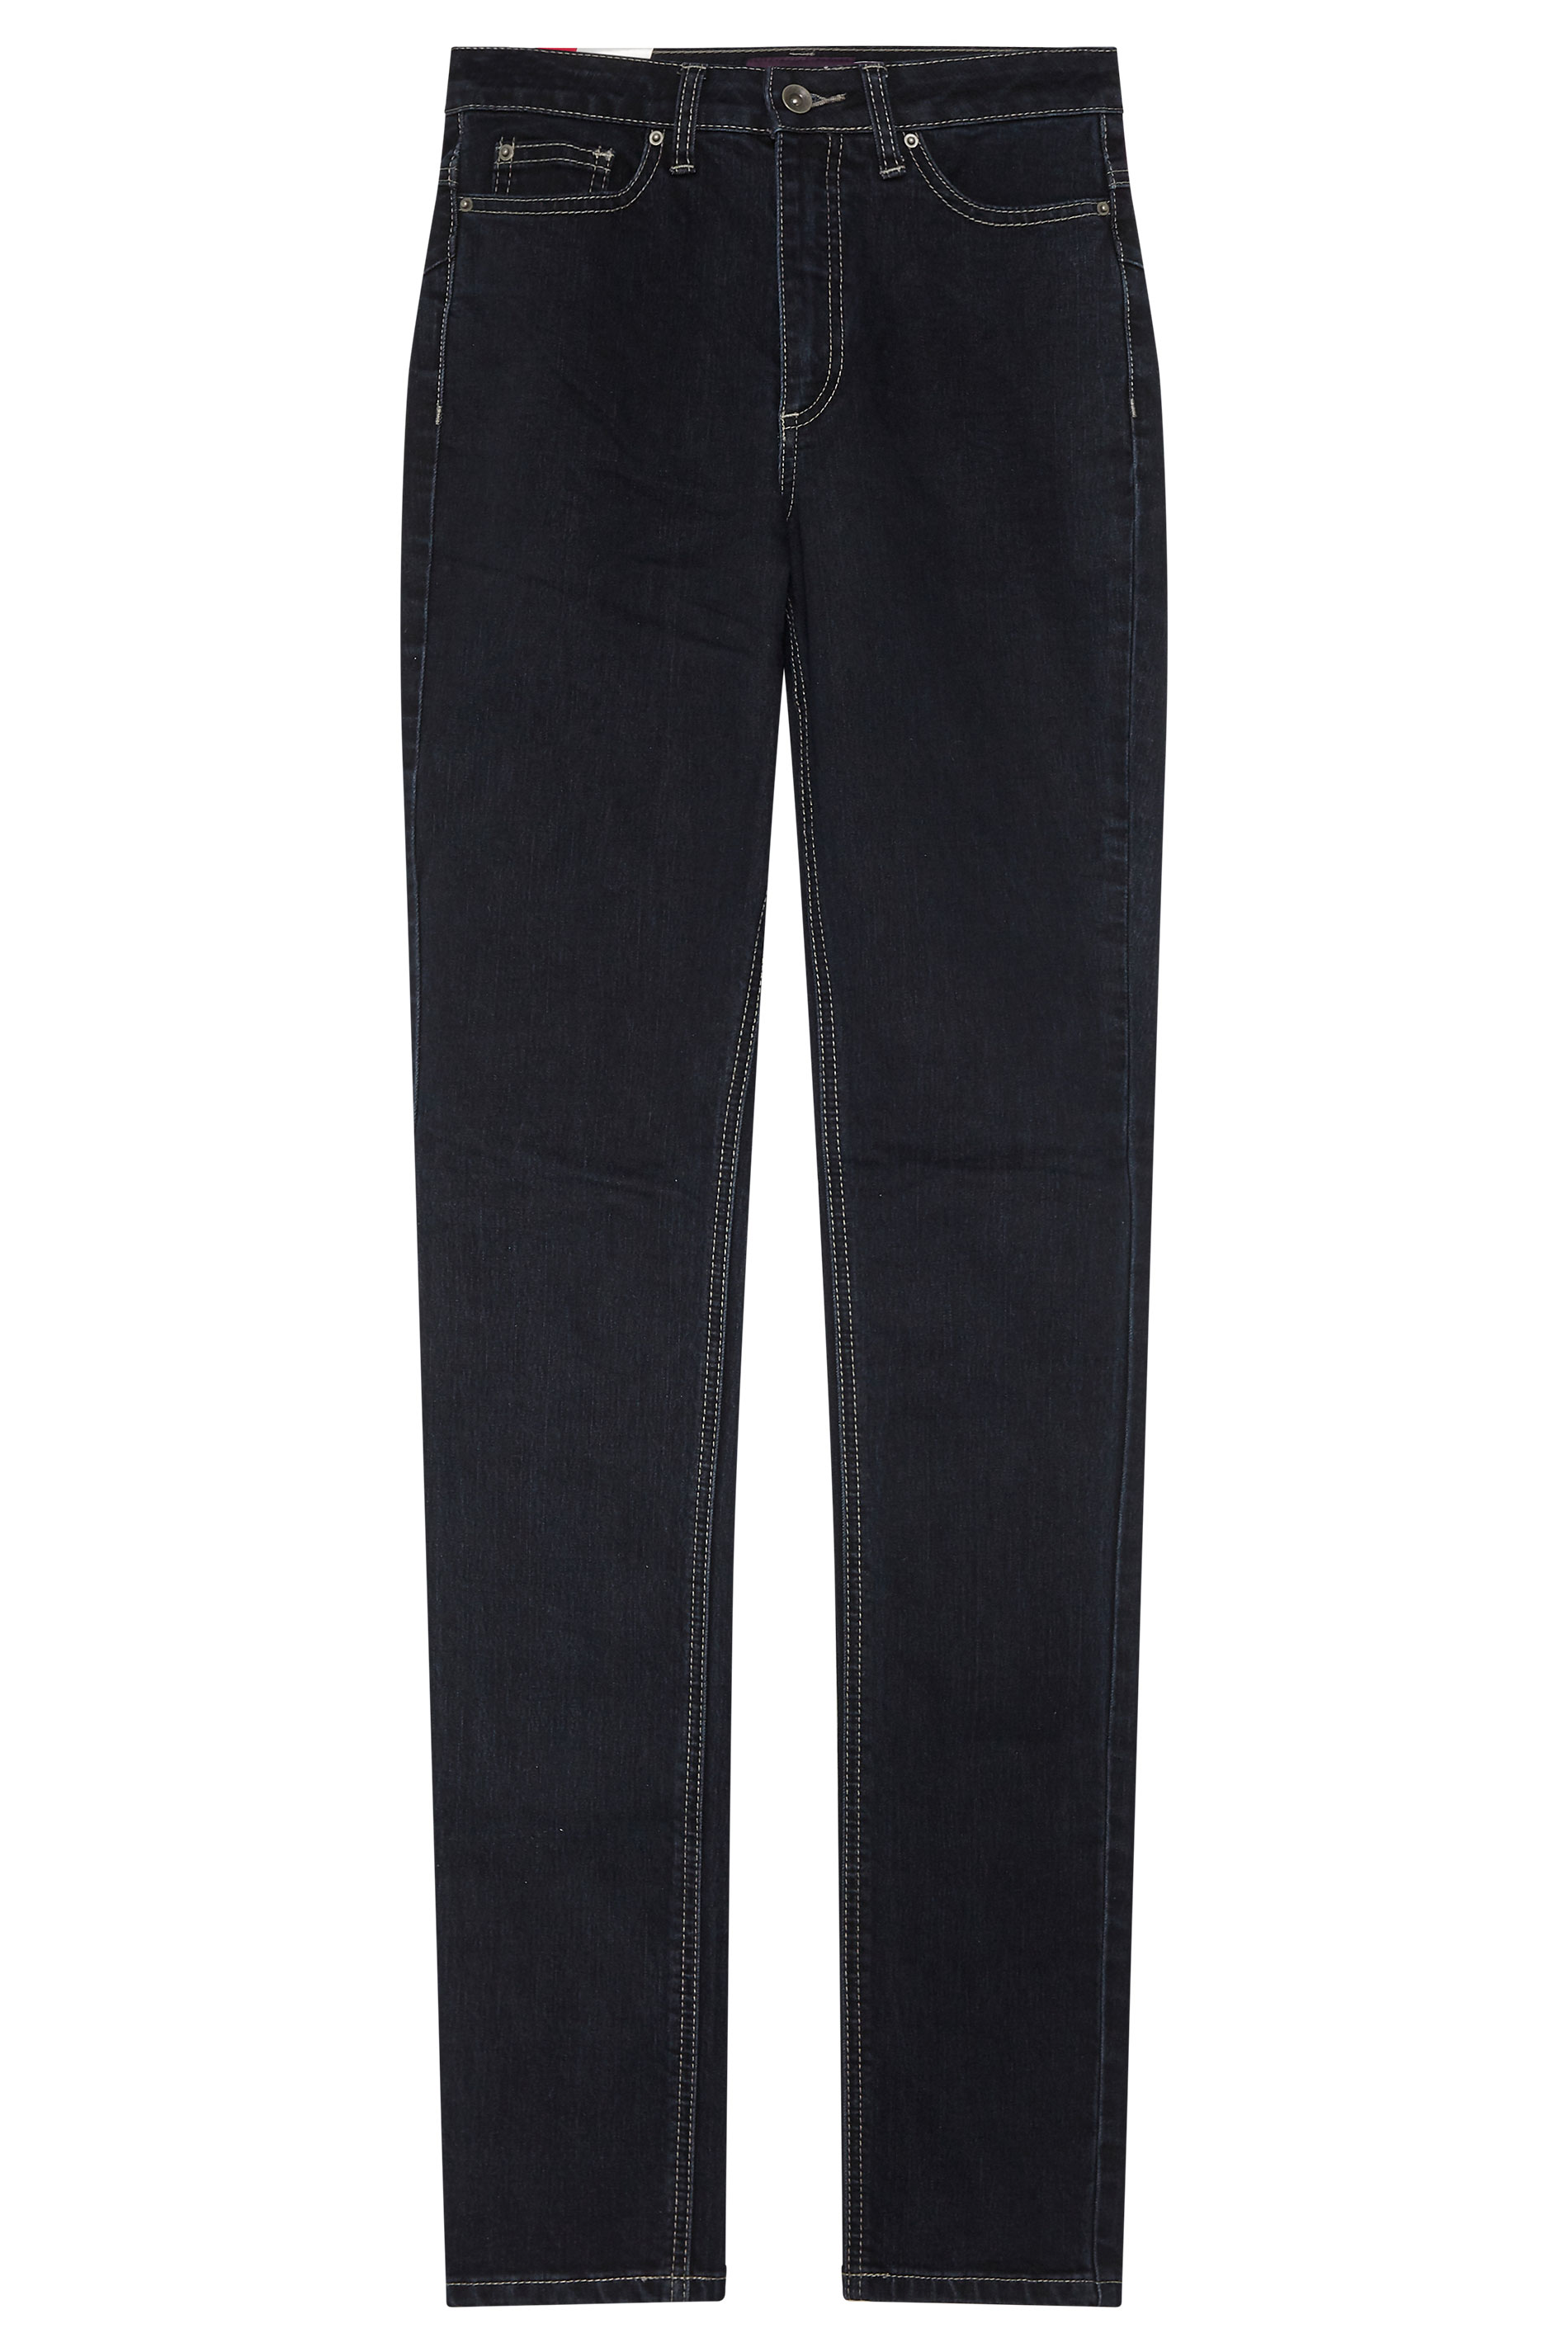 Dark Indigo Straight Leg Jeans